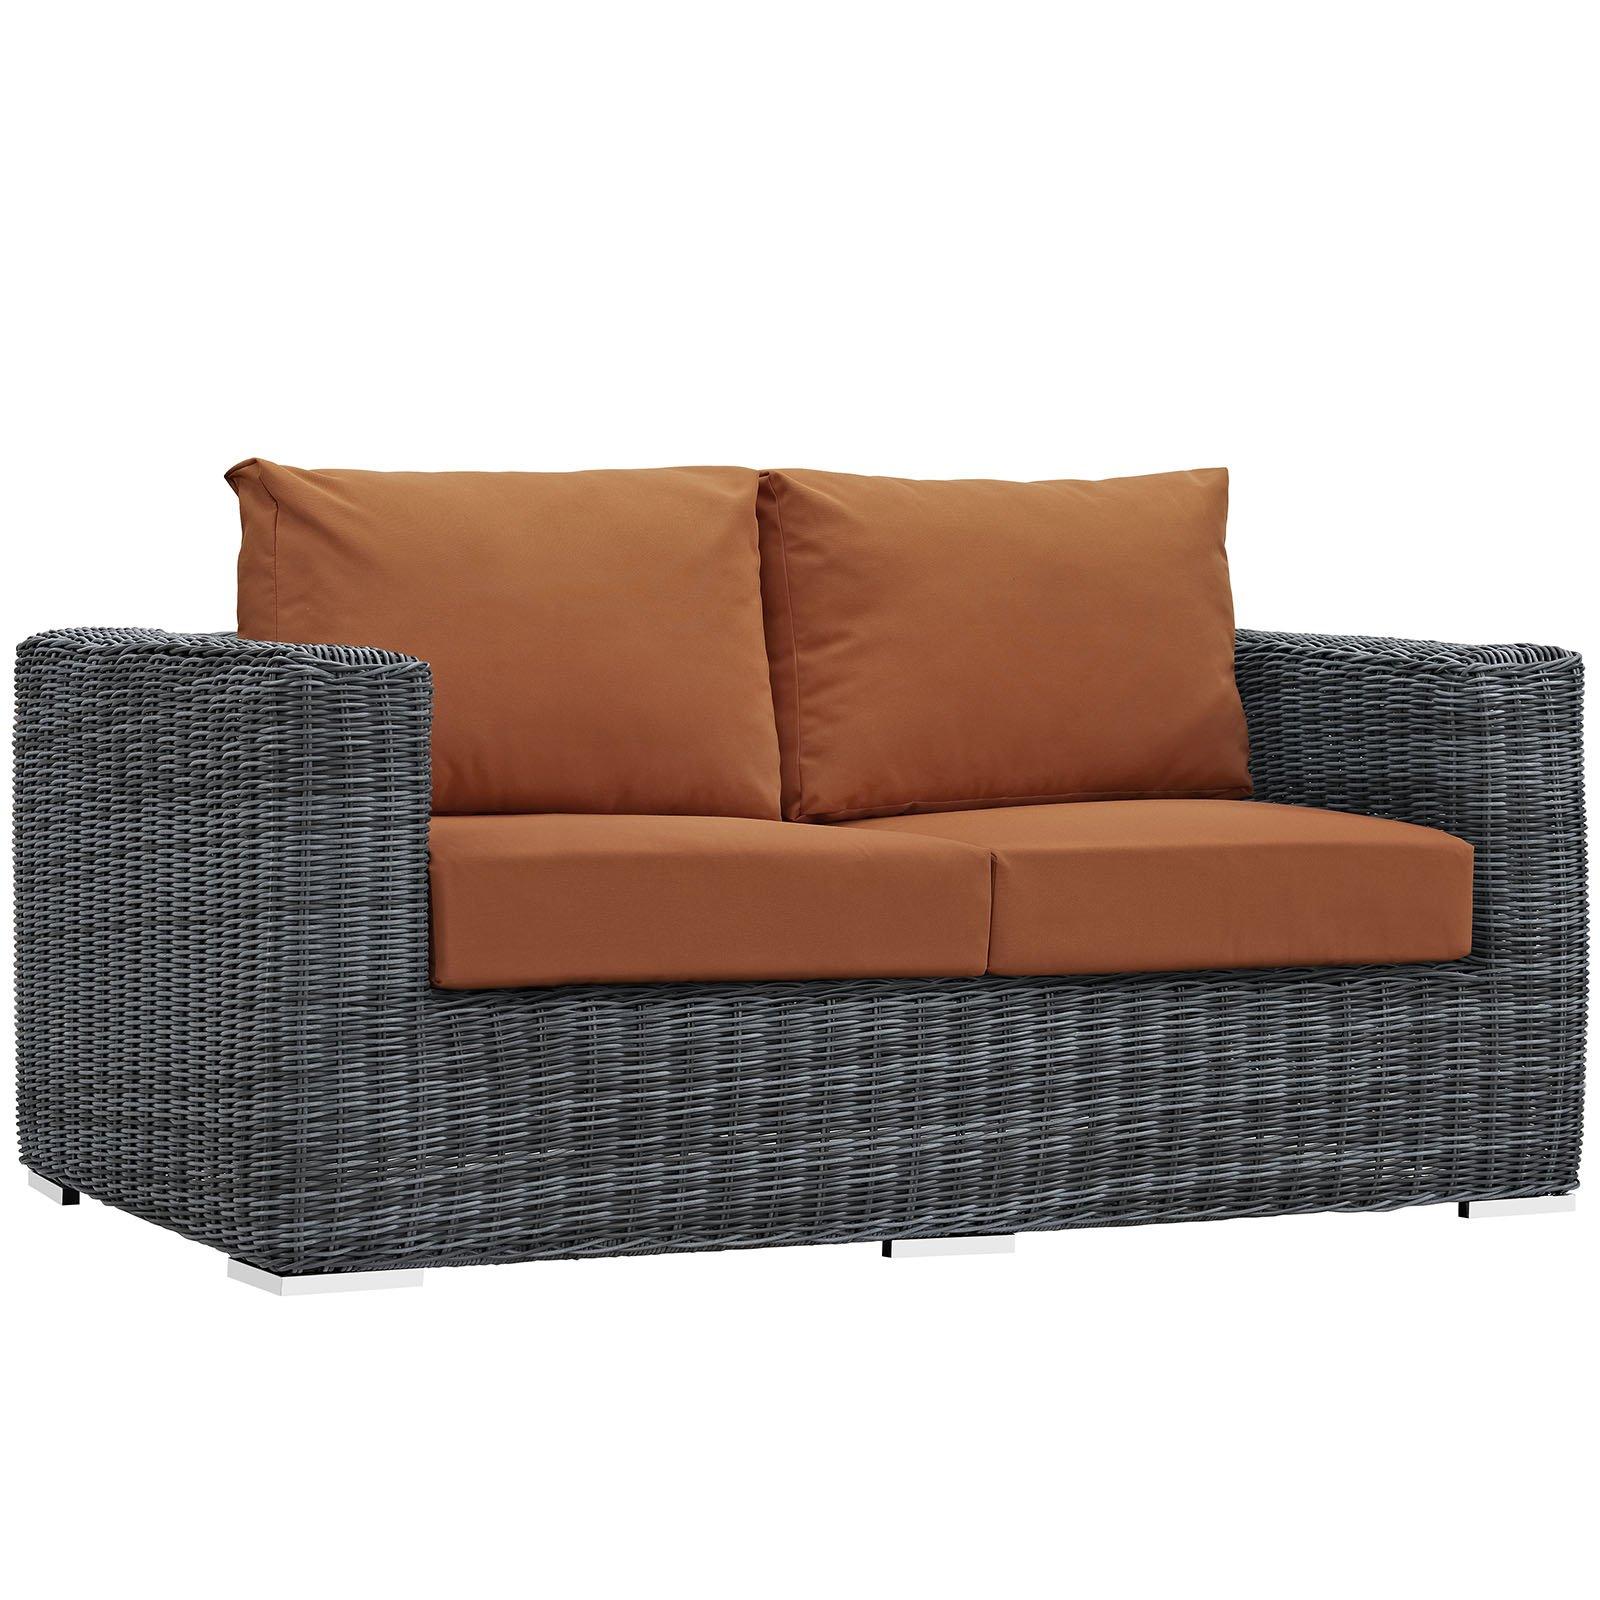 Modway Summon Outdoor Patio Loveseat With Sunbrella Brand Tuscan Orange Canvas Cushions